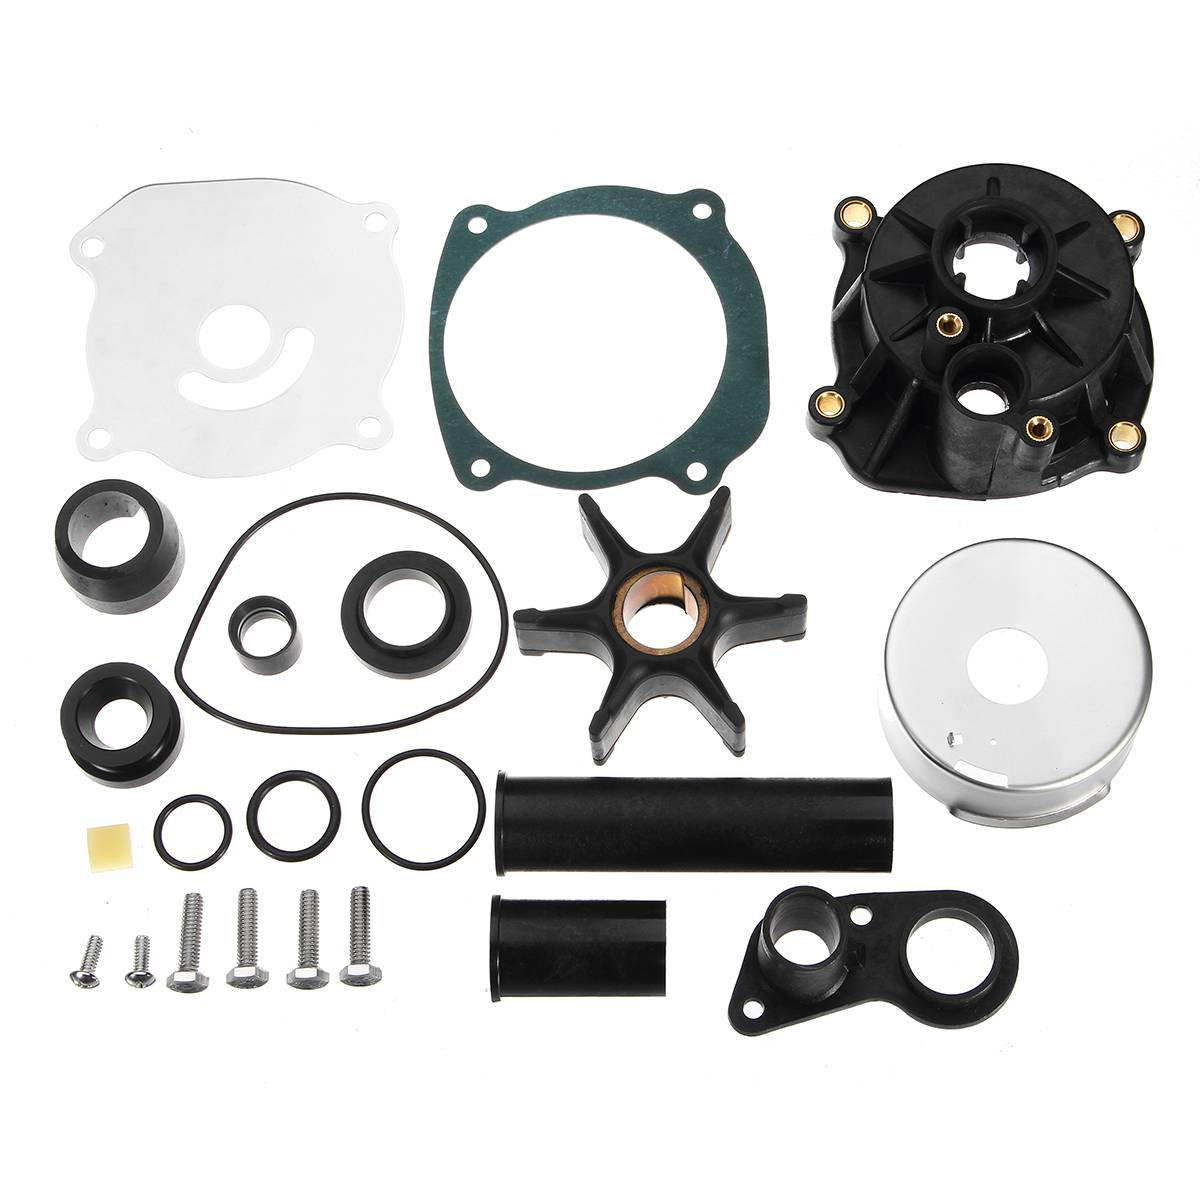 Water Pump Impeller Repair Kit Set Housing Rubber + Metal For Johnson Evinrude 75-250HP 5001595 For Sierra Marine 18-3315-2